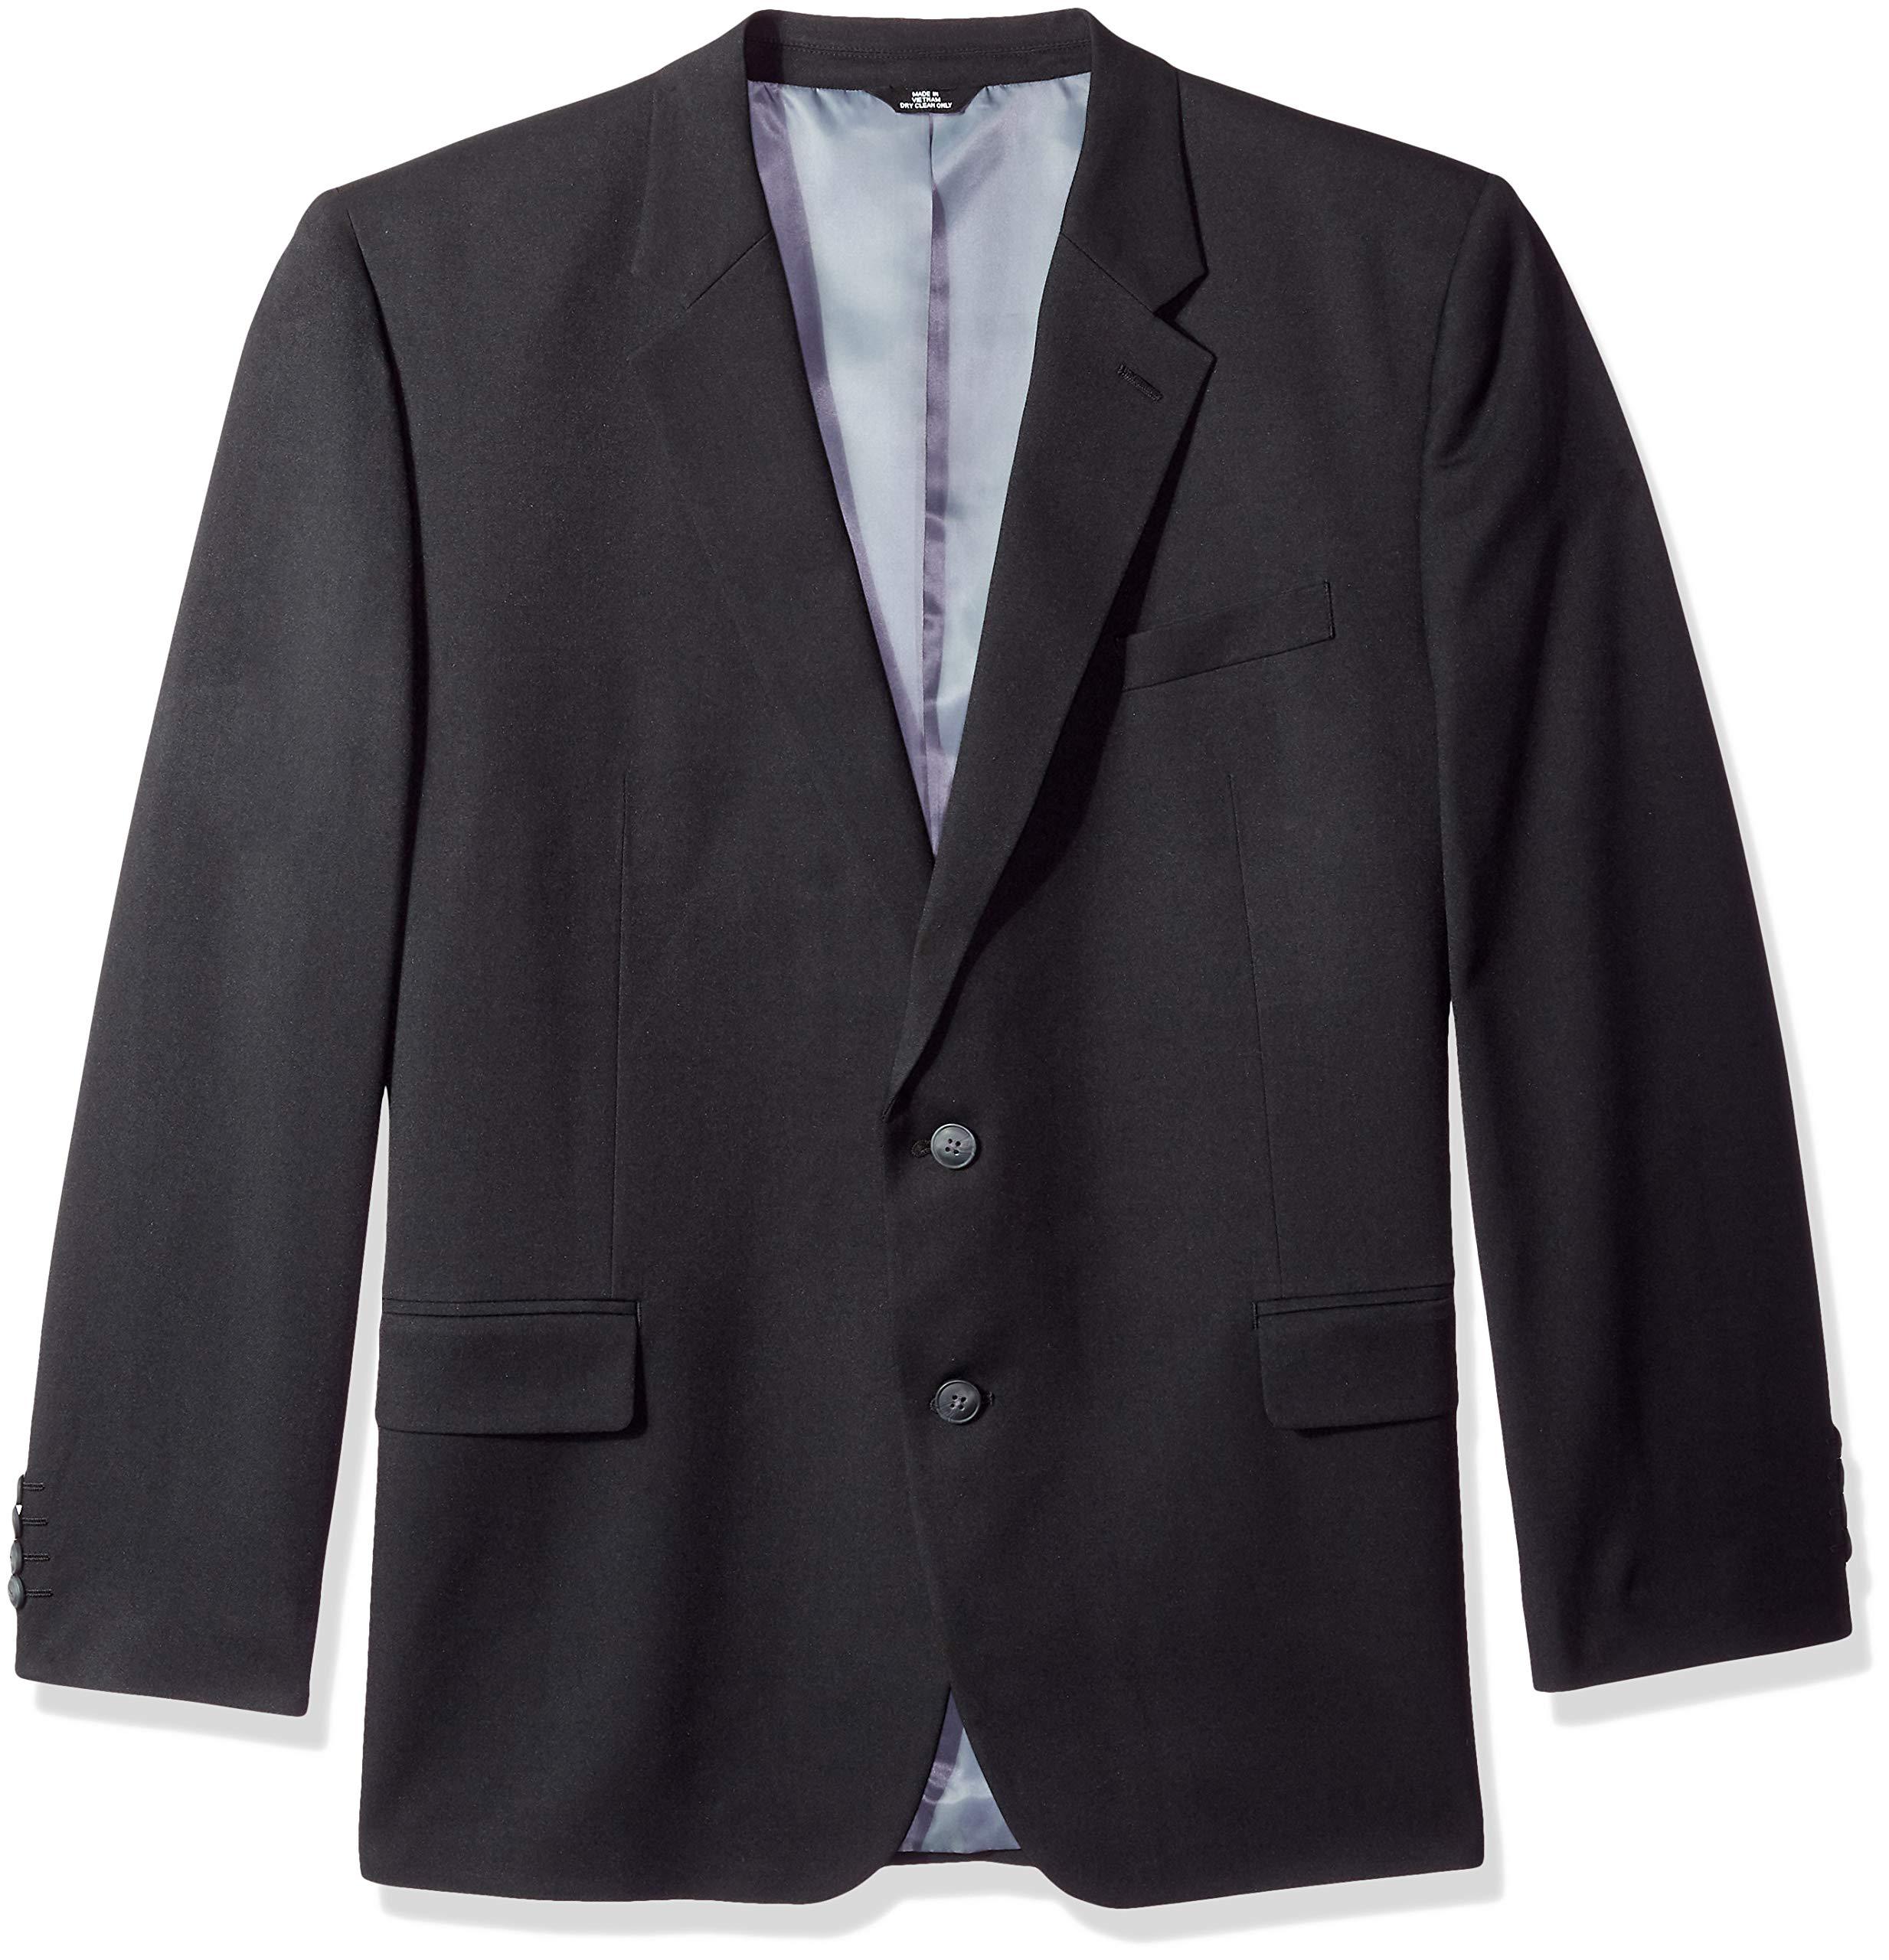 Haggar Men's Big and Tall B&T Heather Twill Stretch Classic Fit Suit Separate Coat, Black, 50L